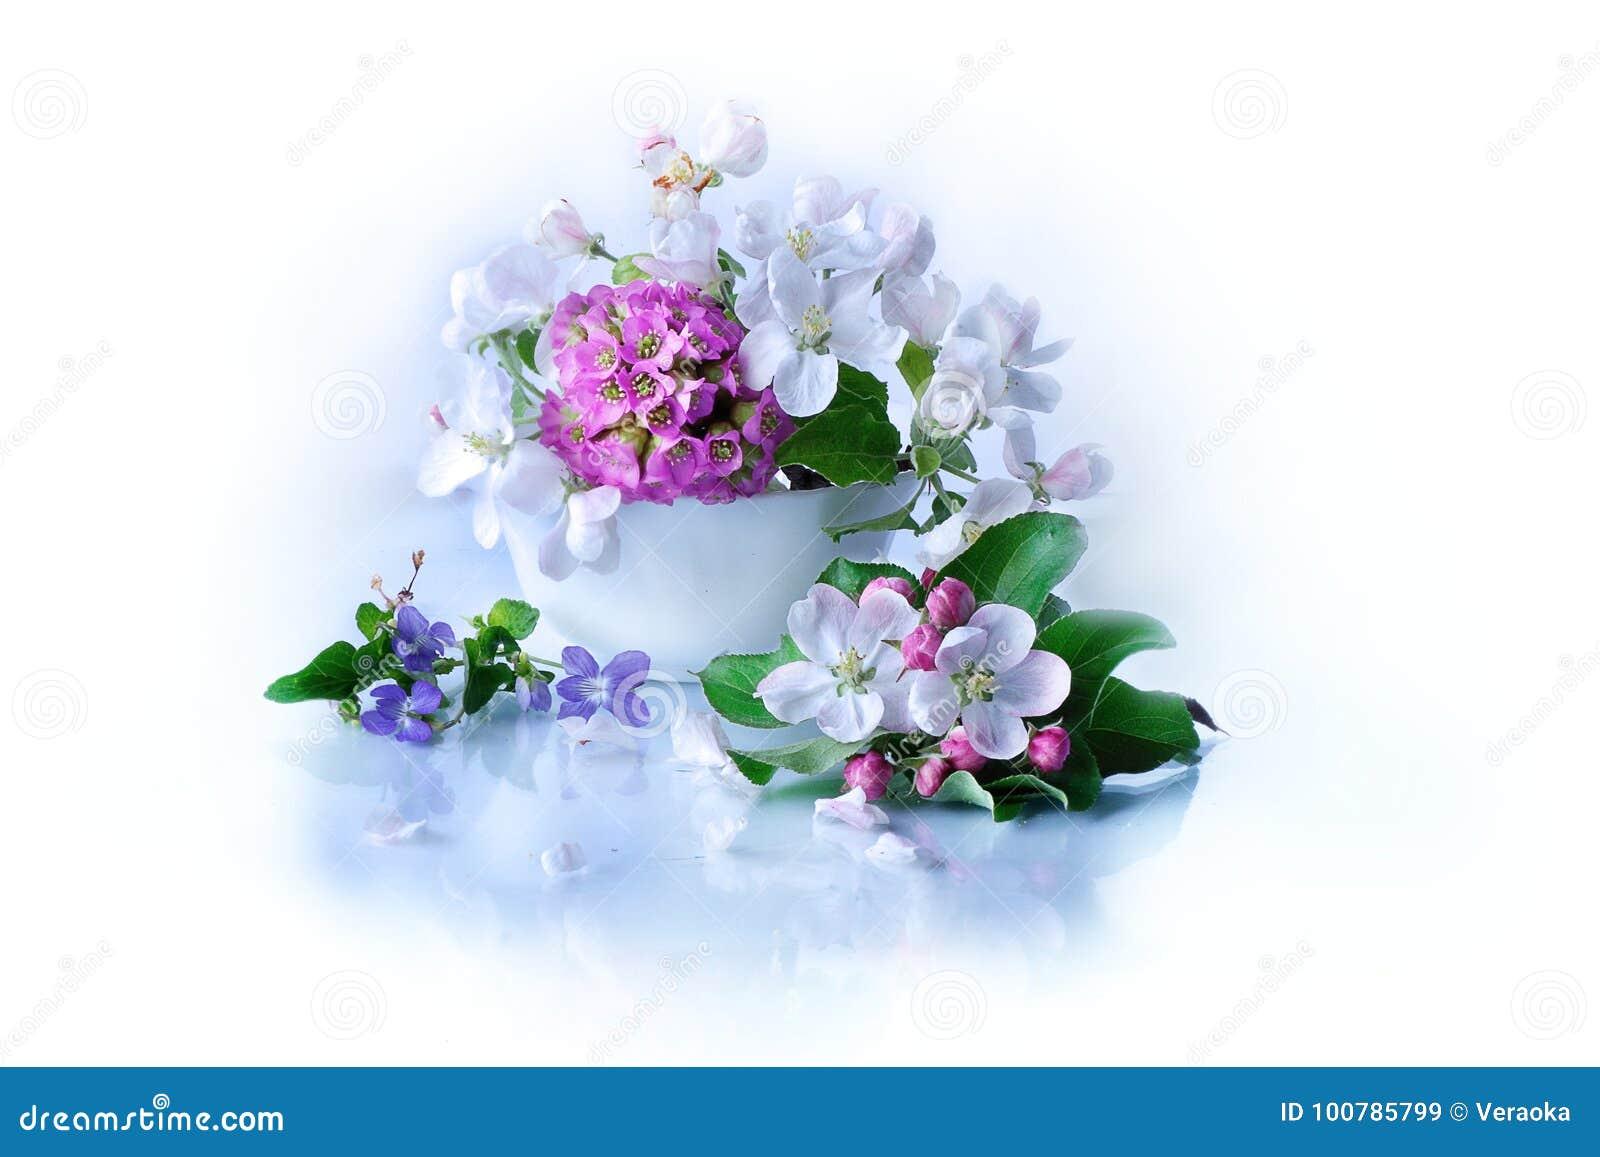 Burevestnik beautiful flowers in basket stock image image of burevestnik beautiful flowers in basket izmirmasajfo